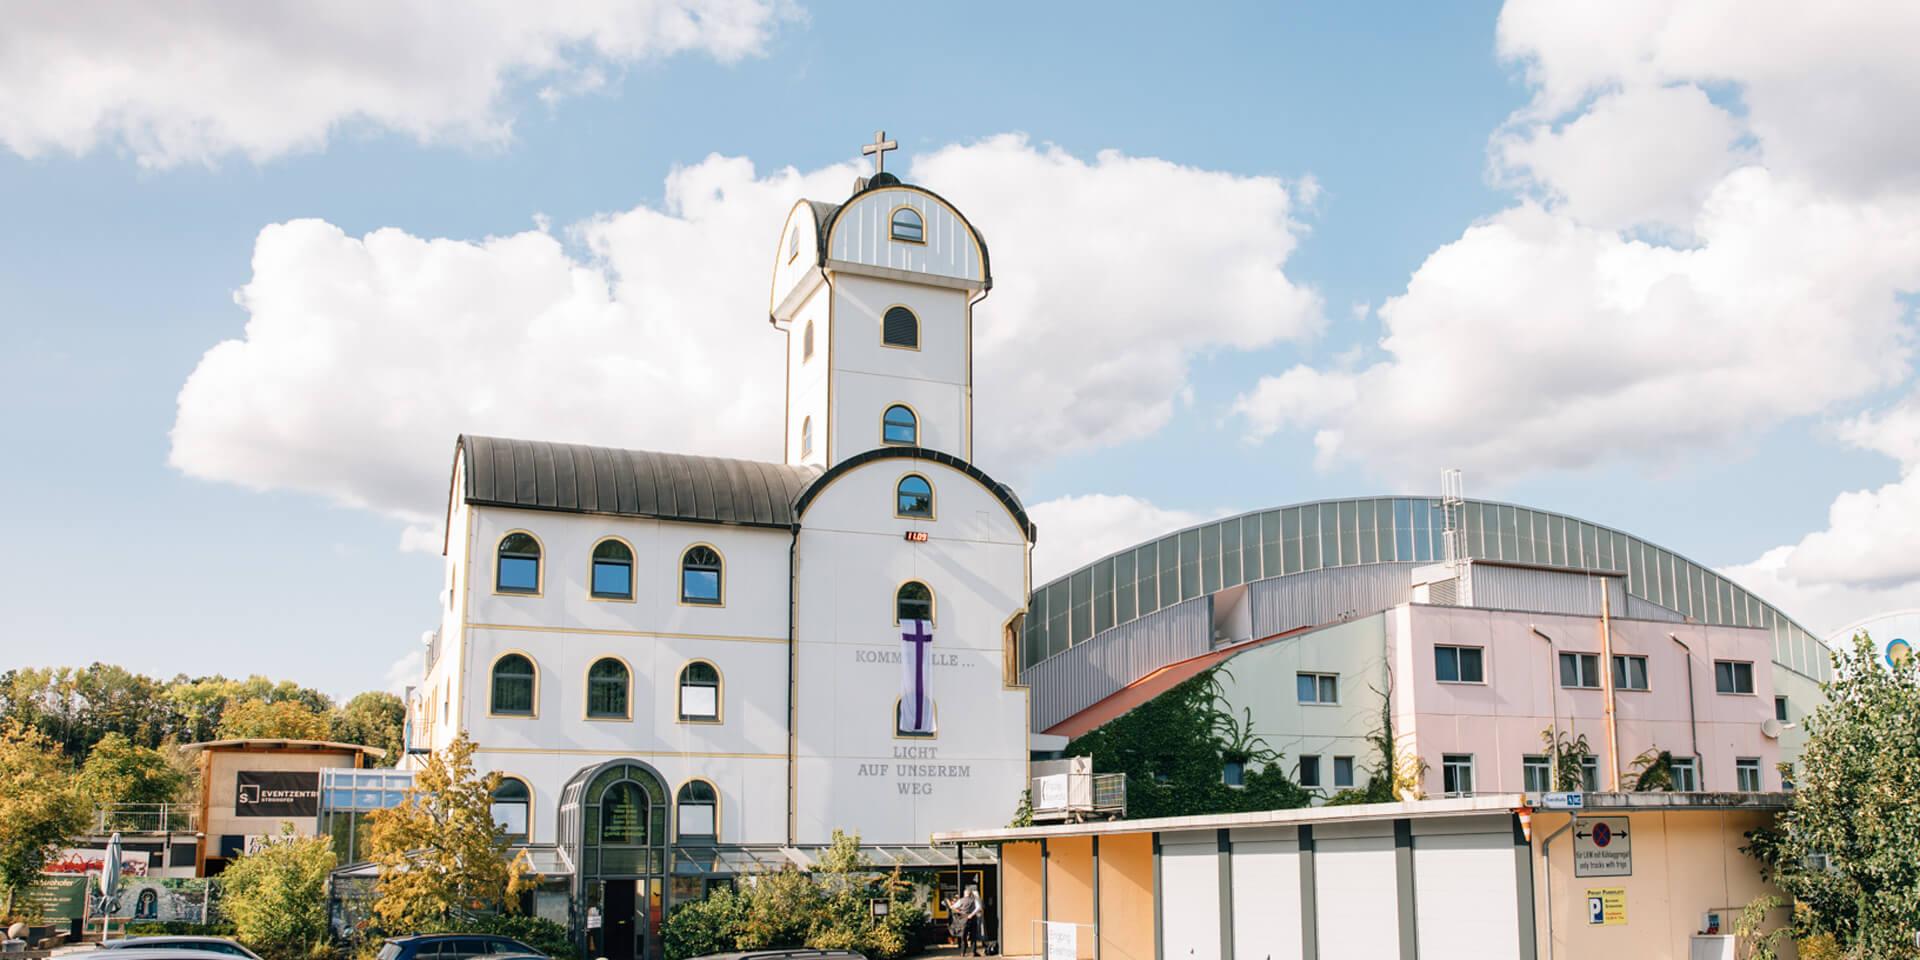 Autobahnkirche Geiselwind